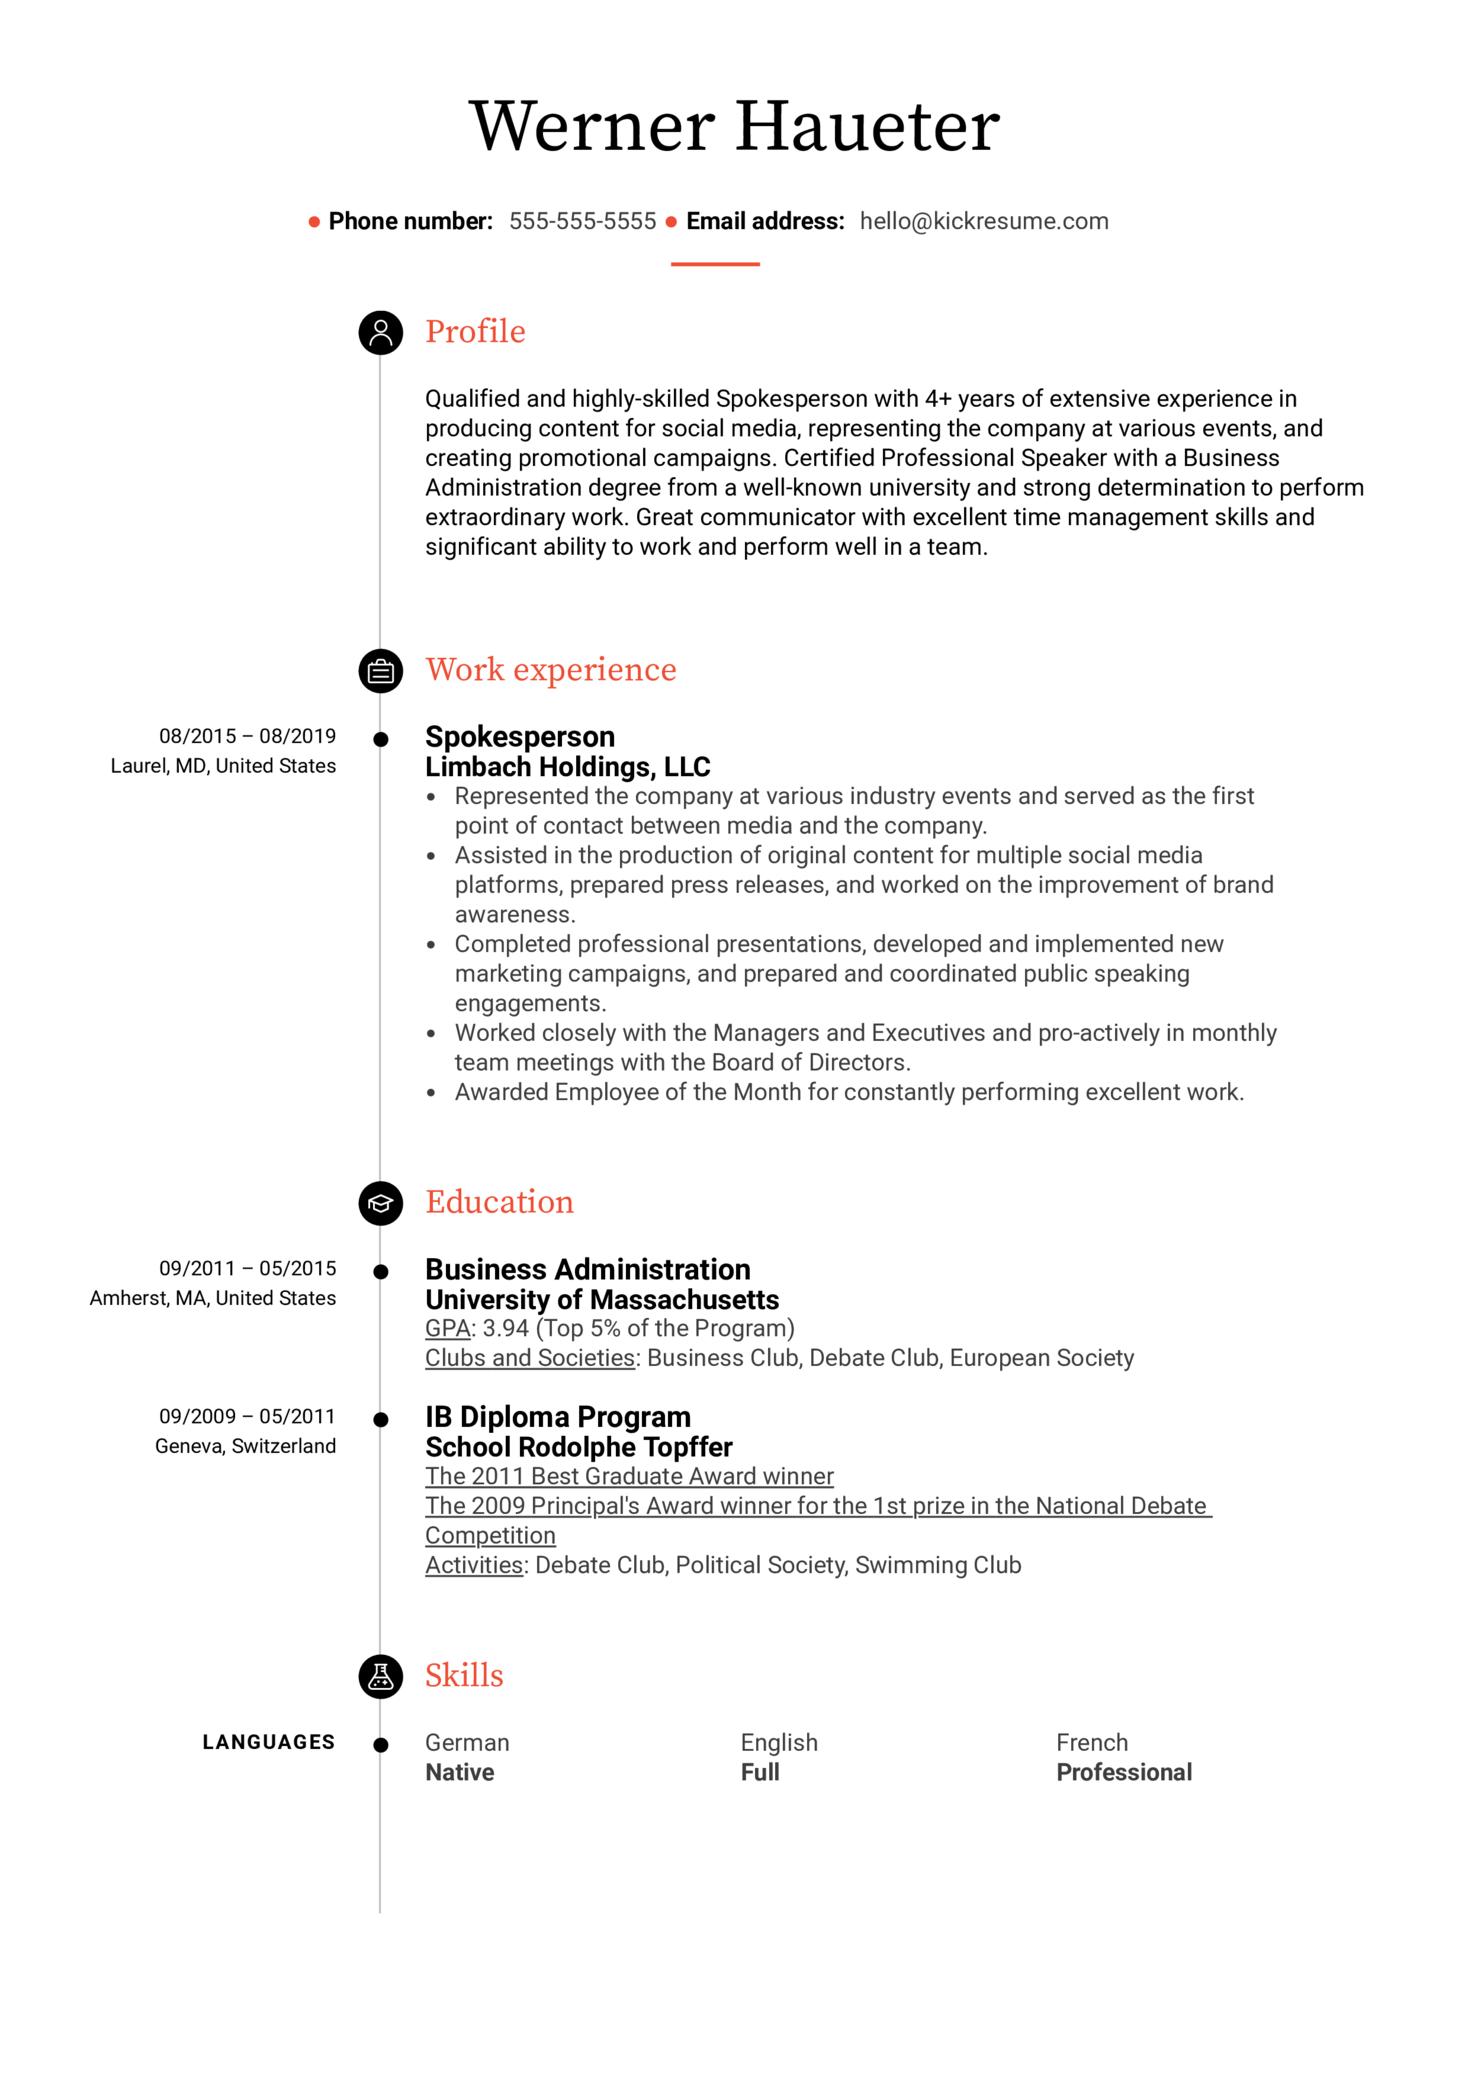 Spokesperson Resume Sample (parte 1)